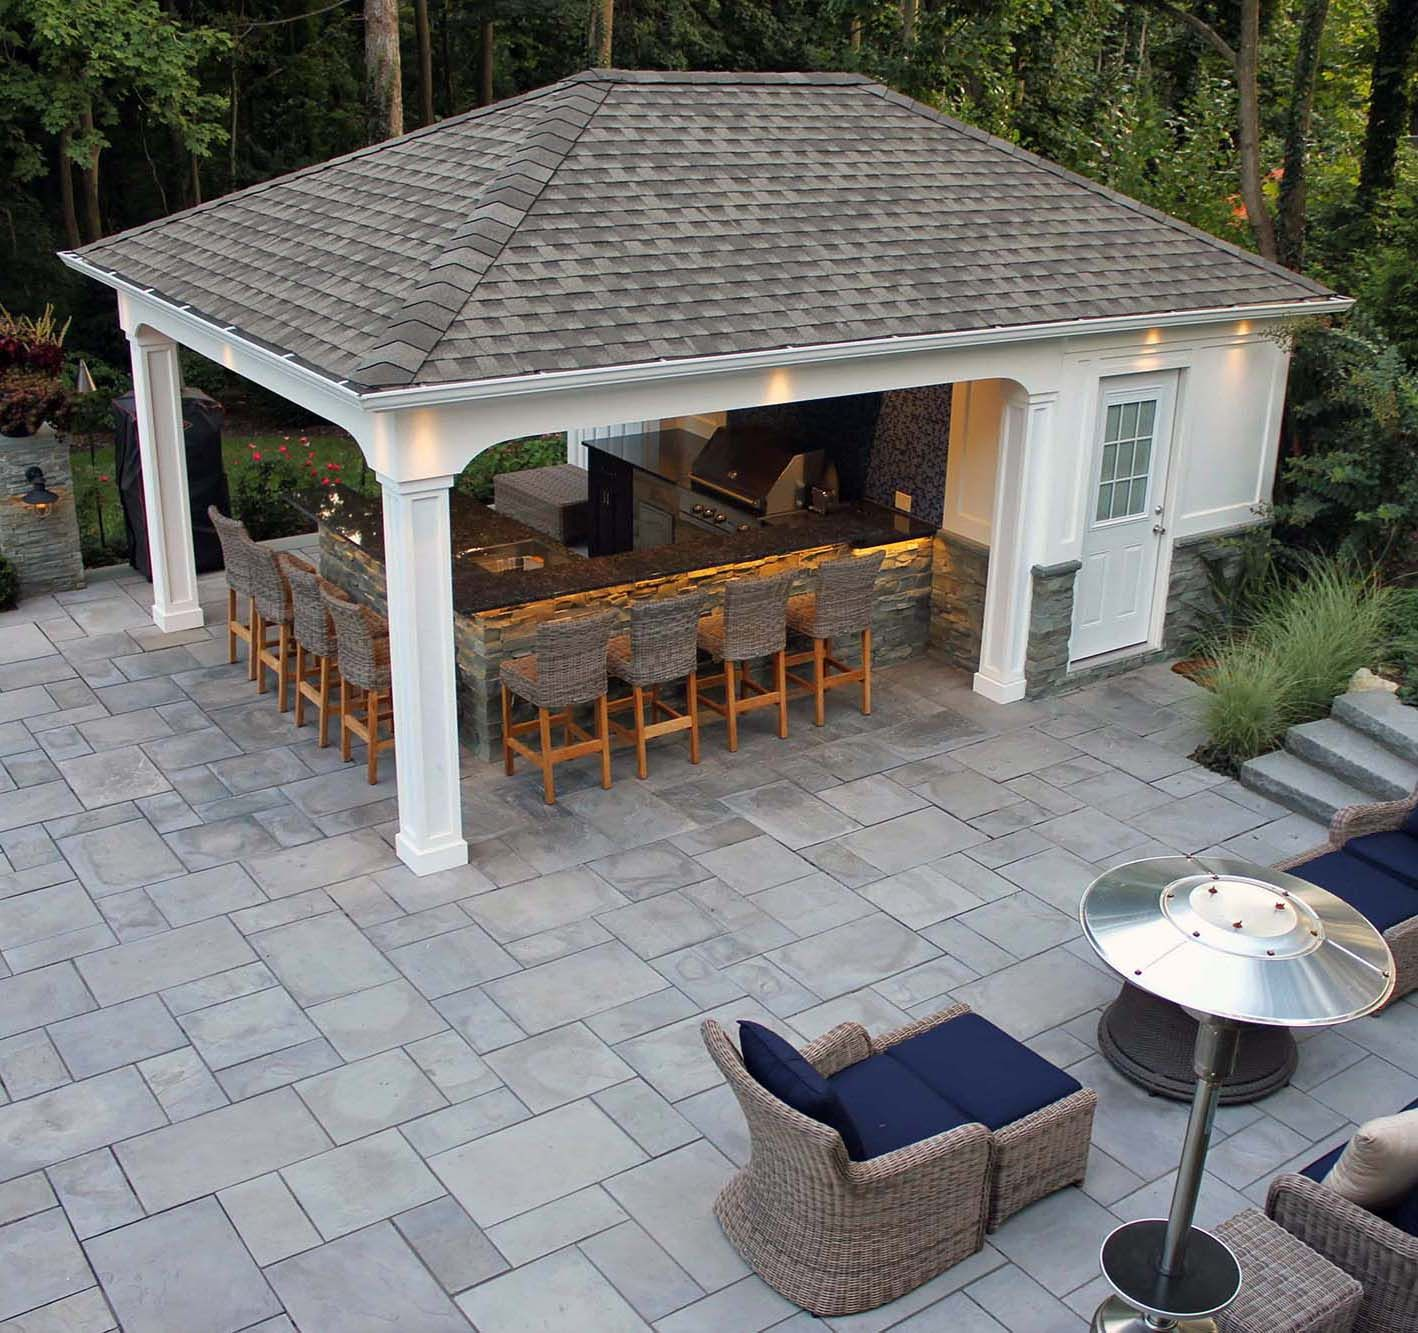 Best Pool House Designs In 2020 Outdoor Remodel Pool House